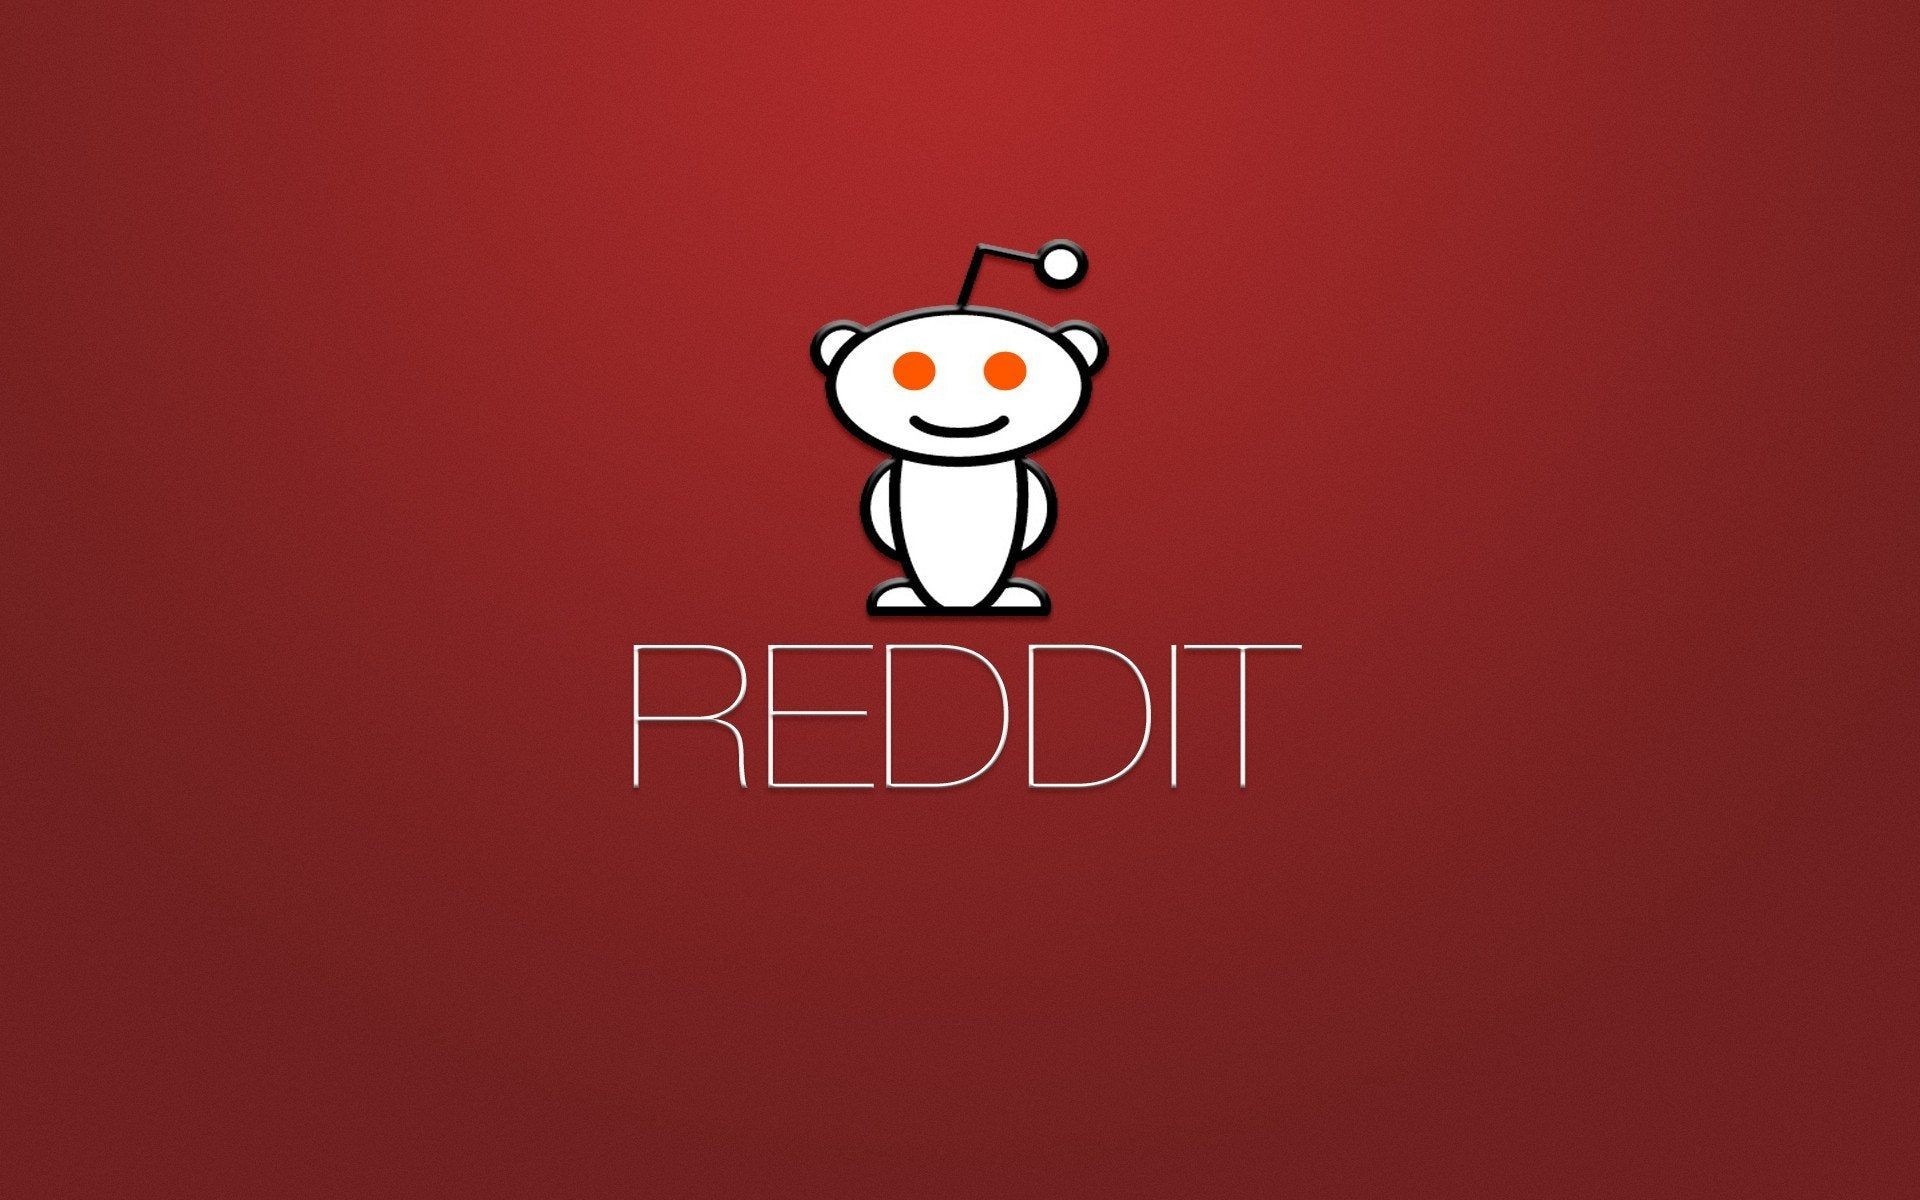 Reddit Wallpapers Top Free Reddit Backgrounds Wallpaperaccess